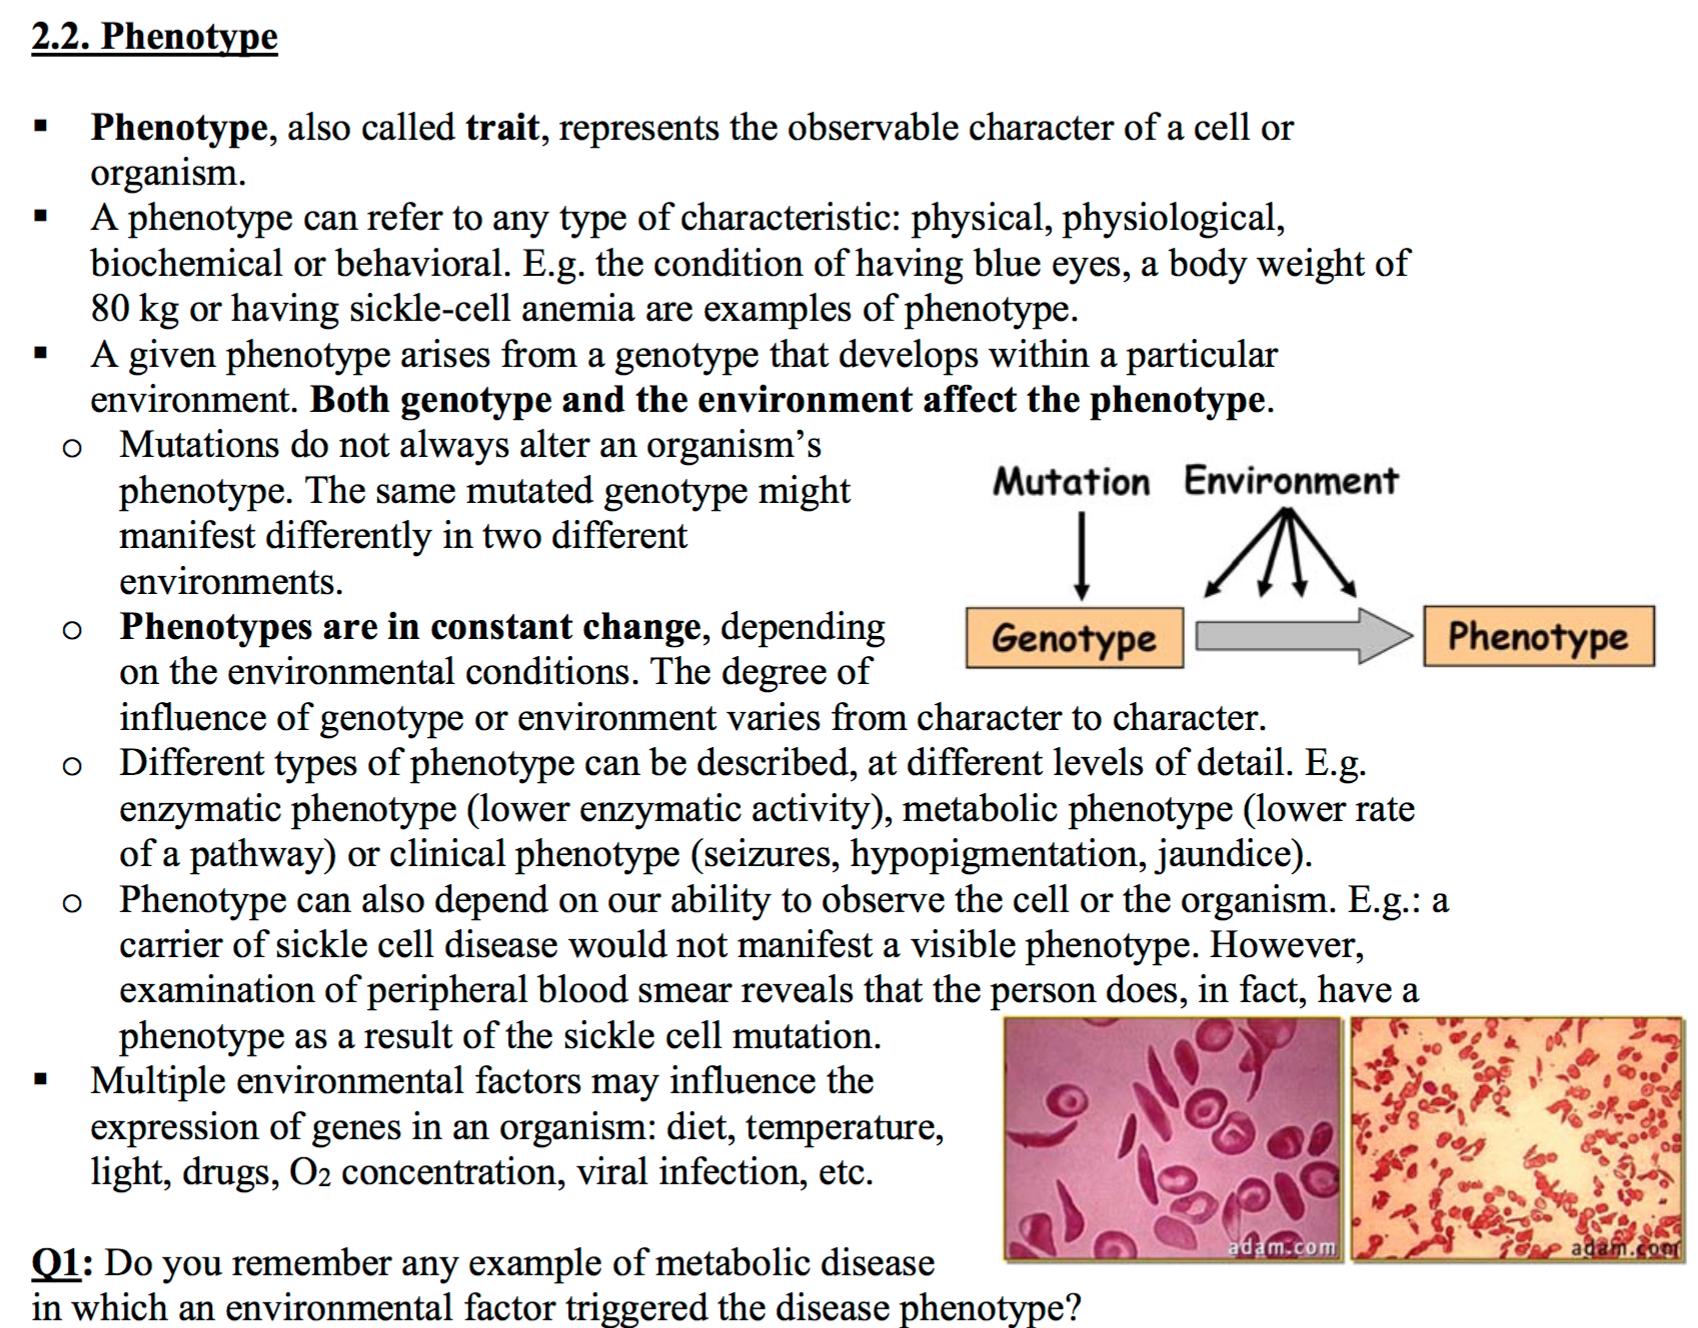 Ccf L1 Polymorphisms And Genetic Mutations Biocg Exam W1